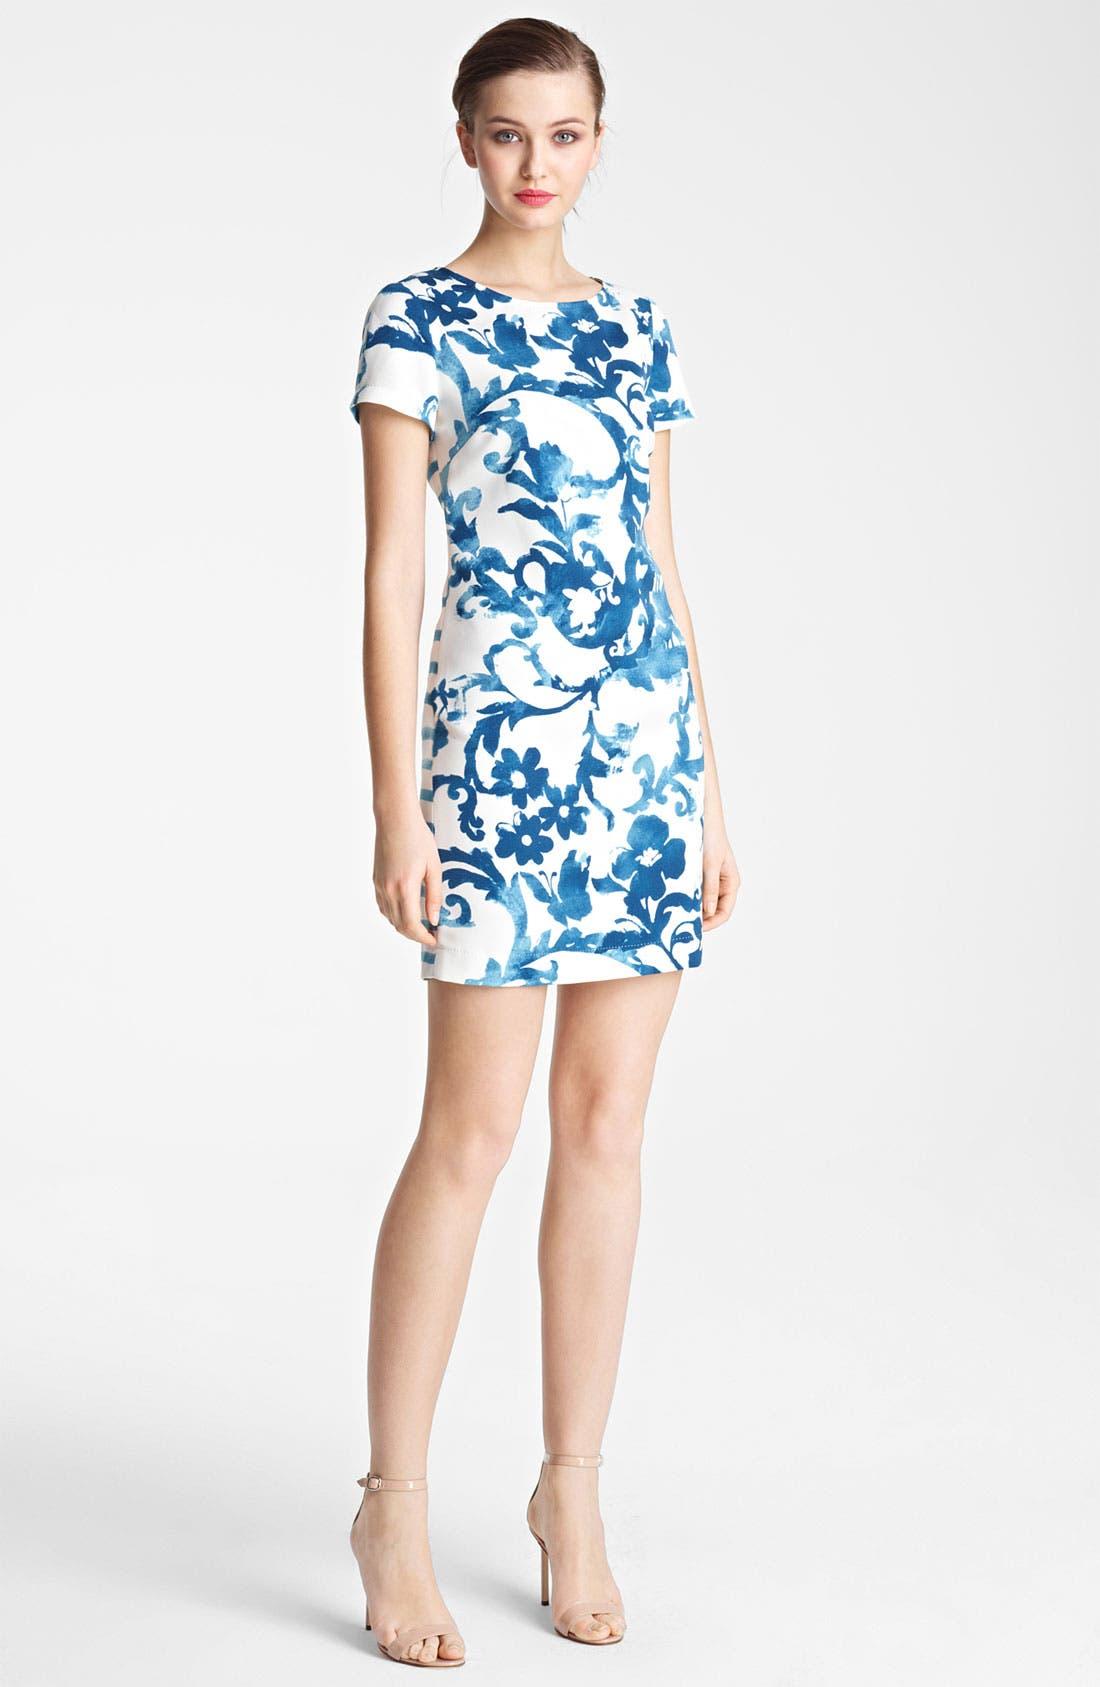 Alternate Image 1 Selected - Moschino Cheap & Chic Mix Print Dress